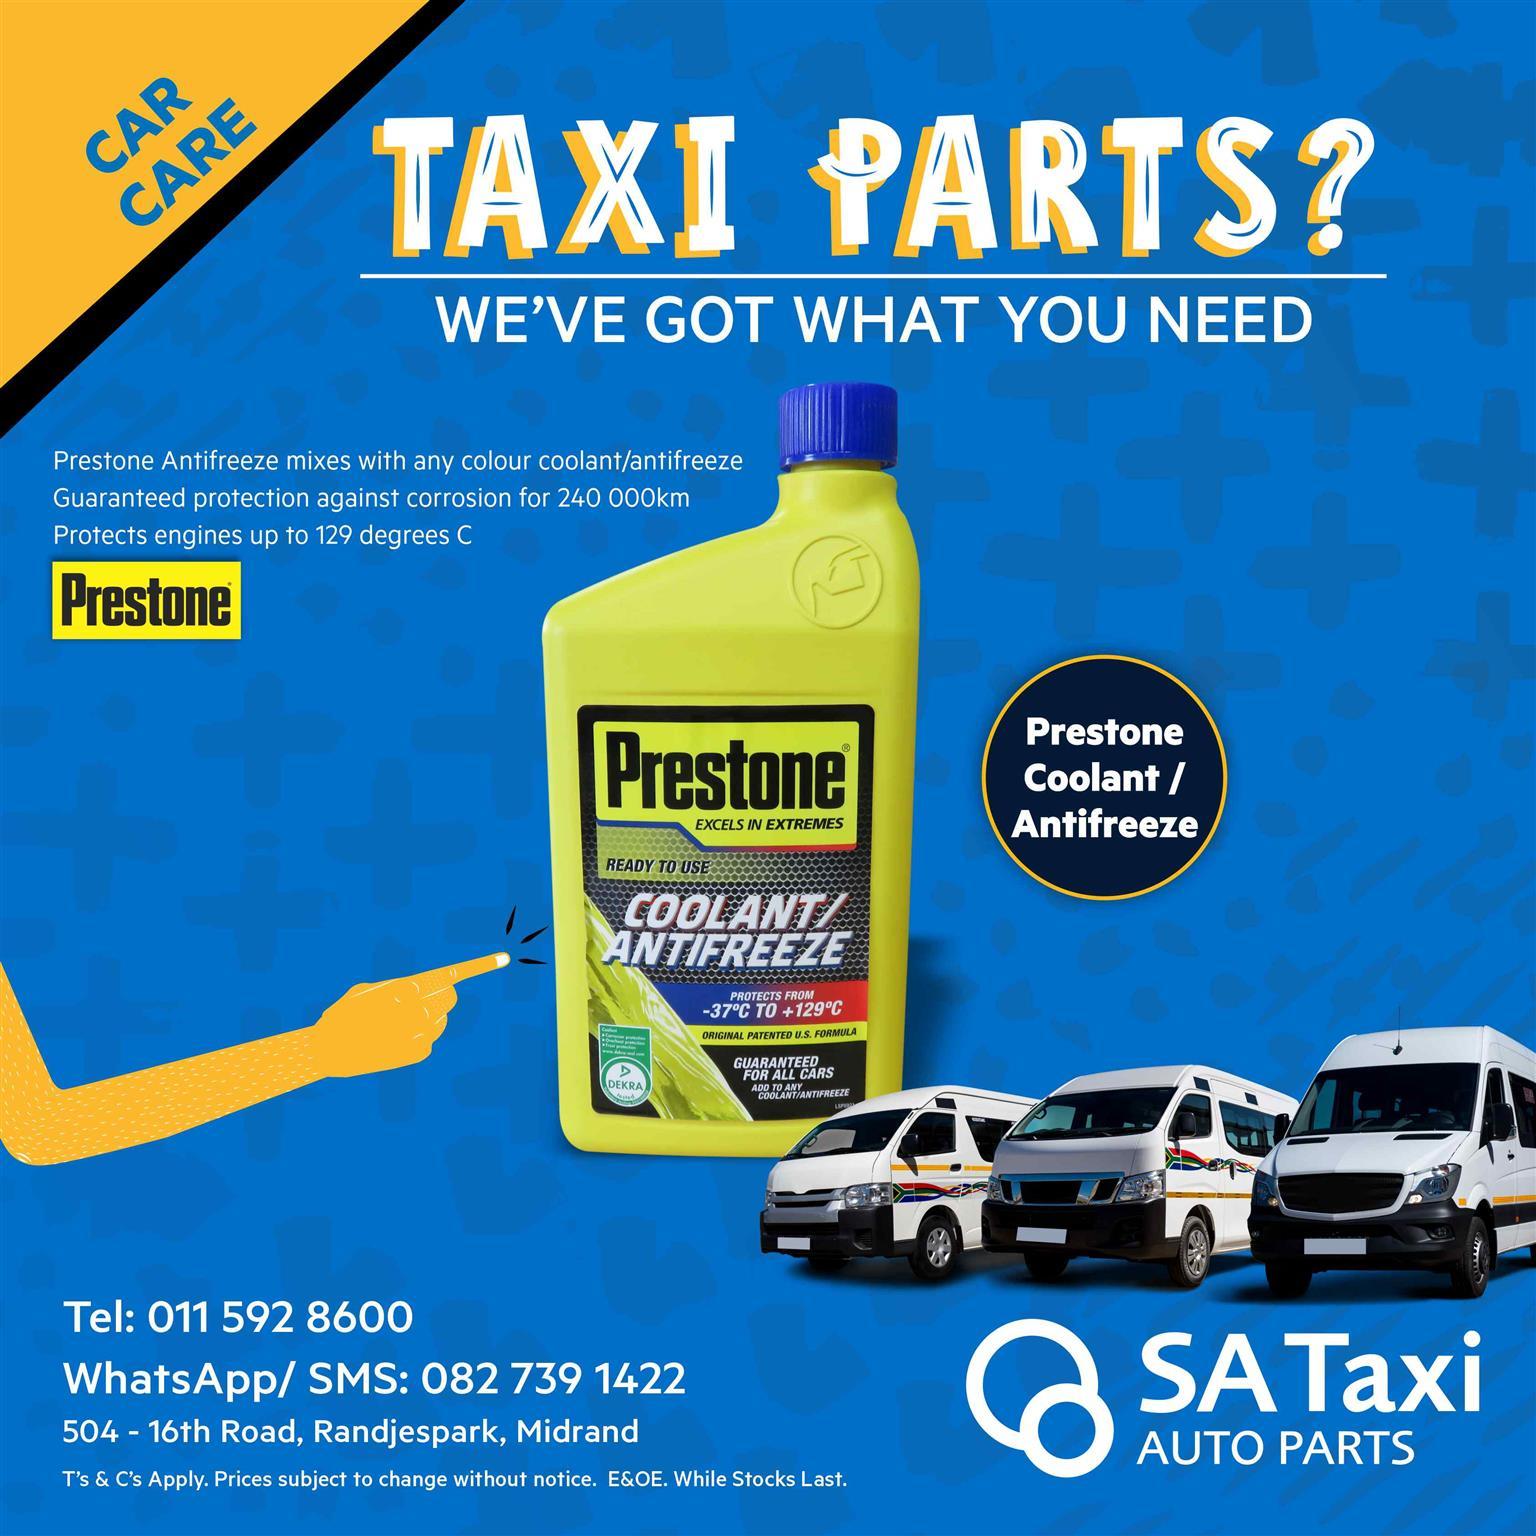 Buy your 1L Prestone Coolant / Antifreeze at SA Taxi Auto Parts